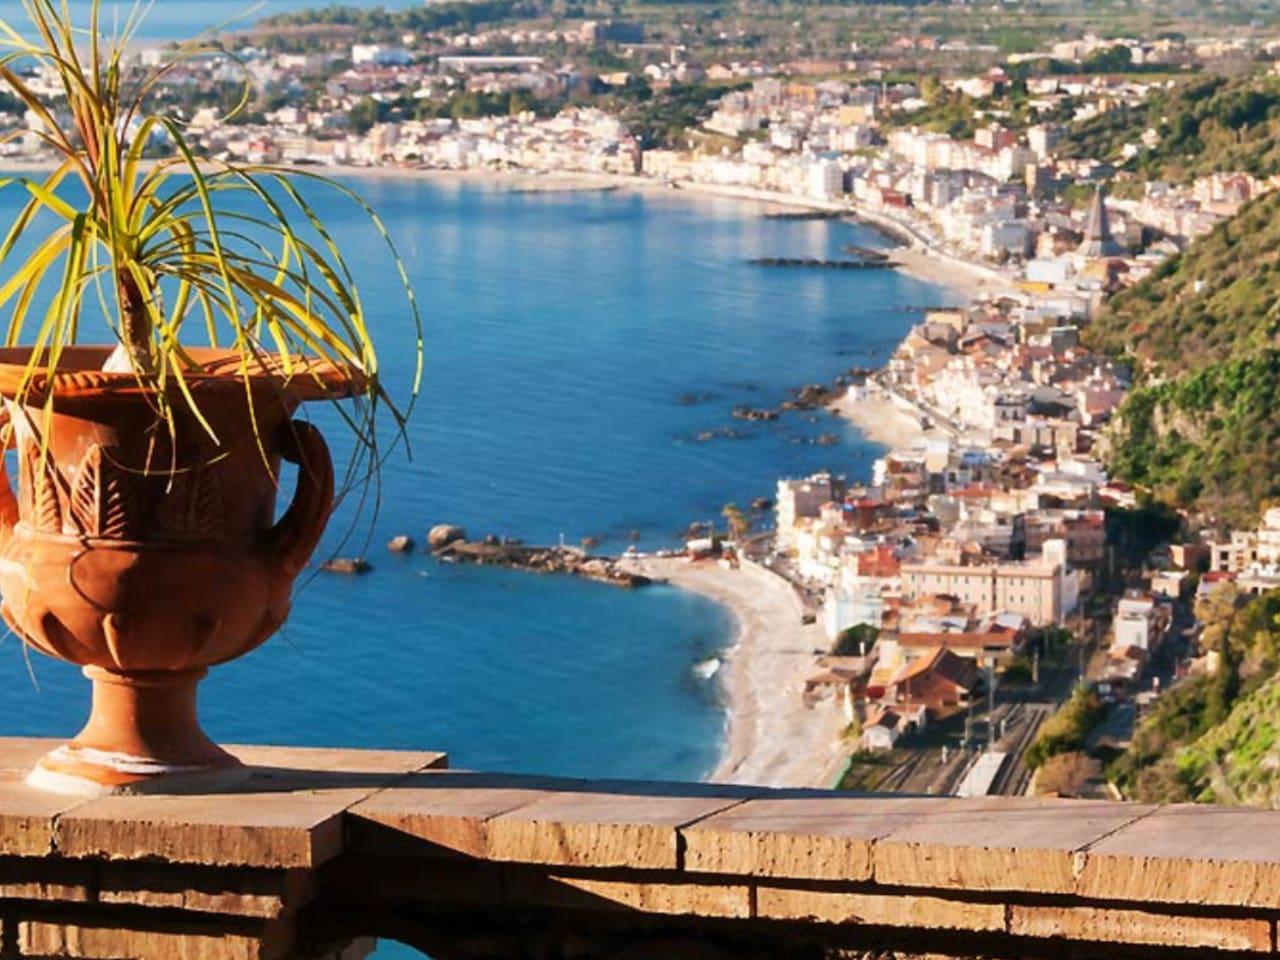 Photo prise à Taormina avec vue sur Giardini Naxos